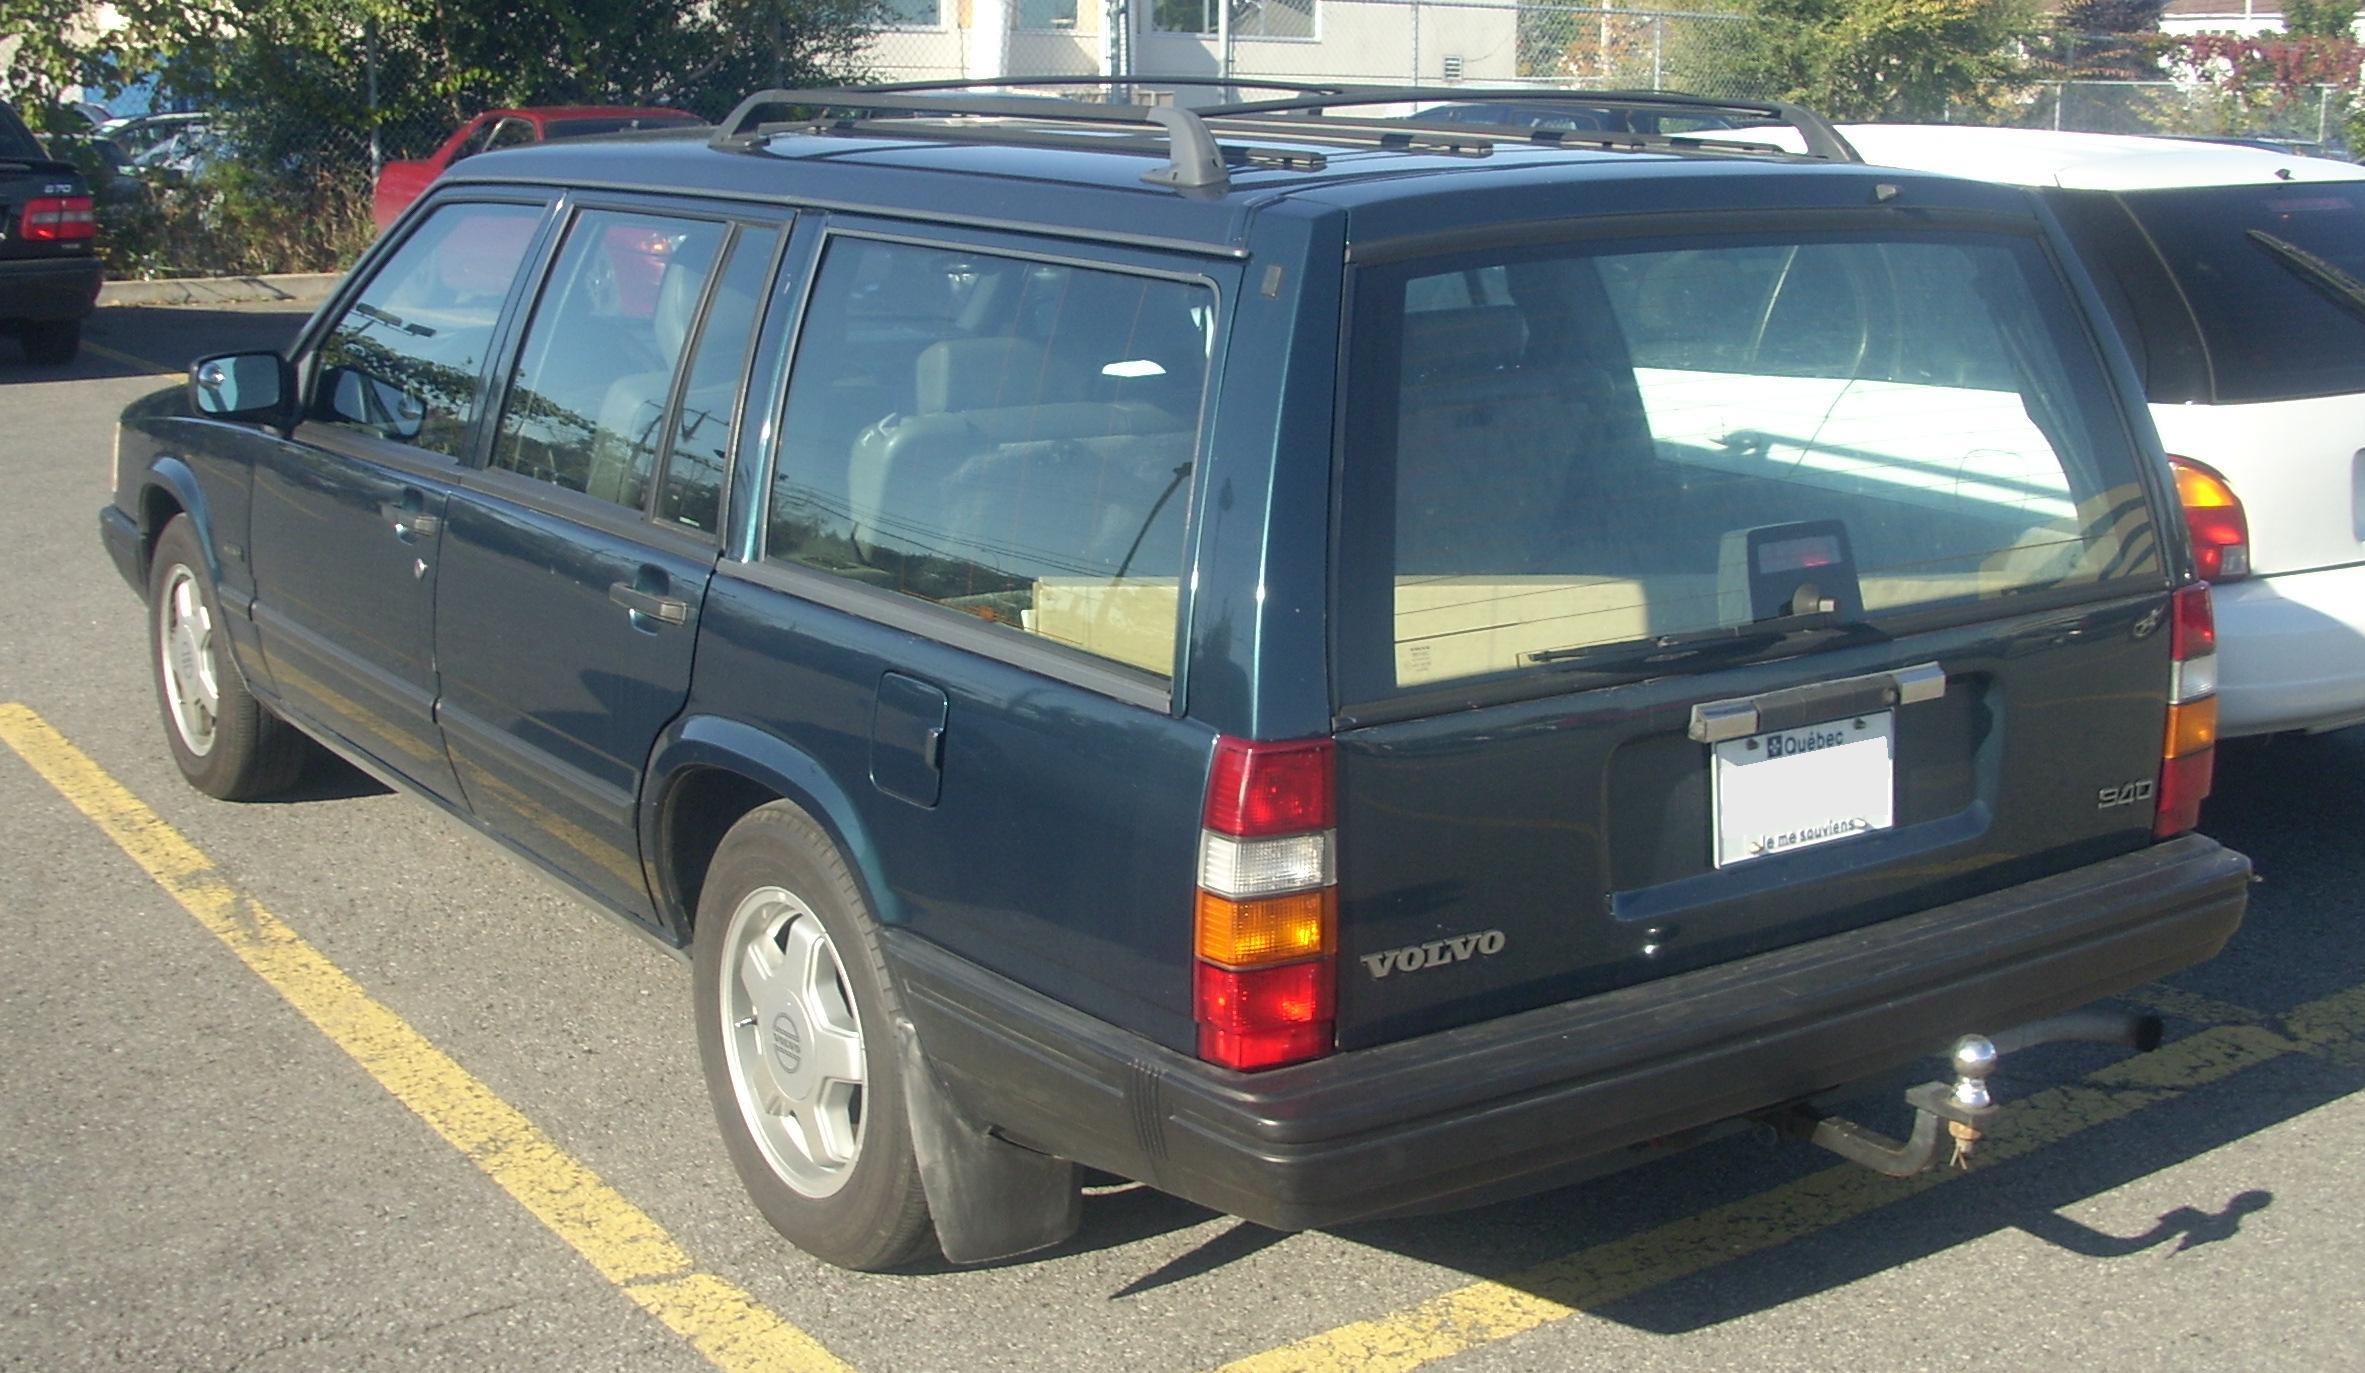 File:'92-'93 Volvo 940 Wagon (Rear).JPG - Wikimedia Commons